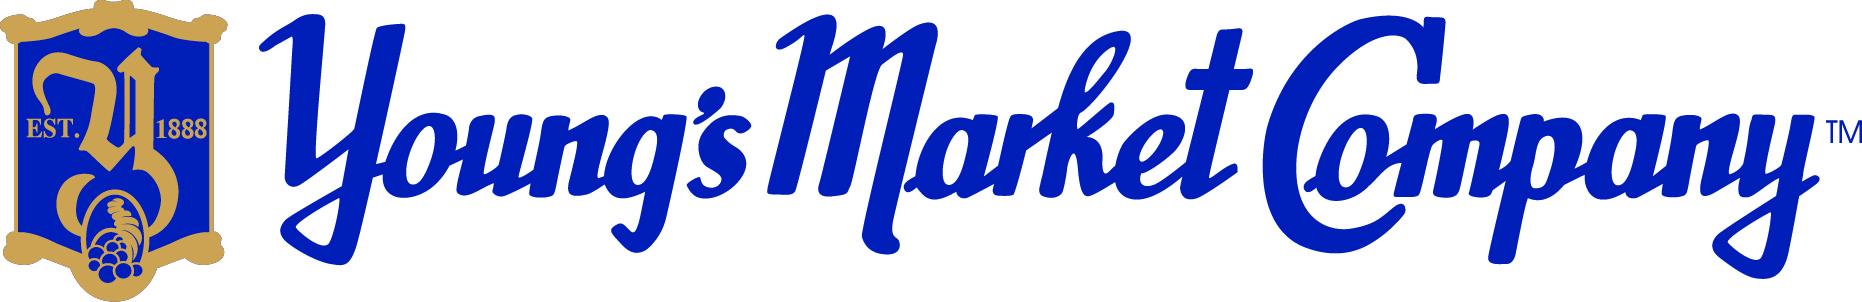 Youngs Market 2C logo.jpg